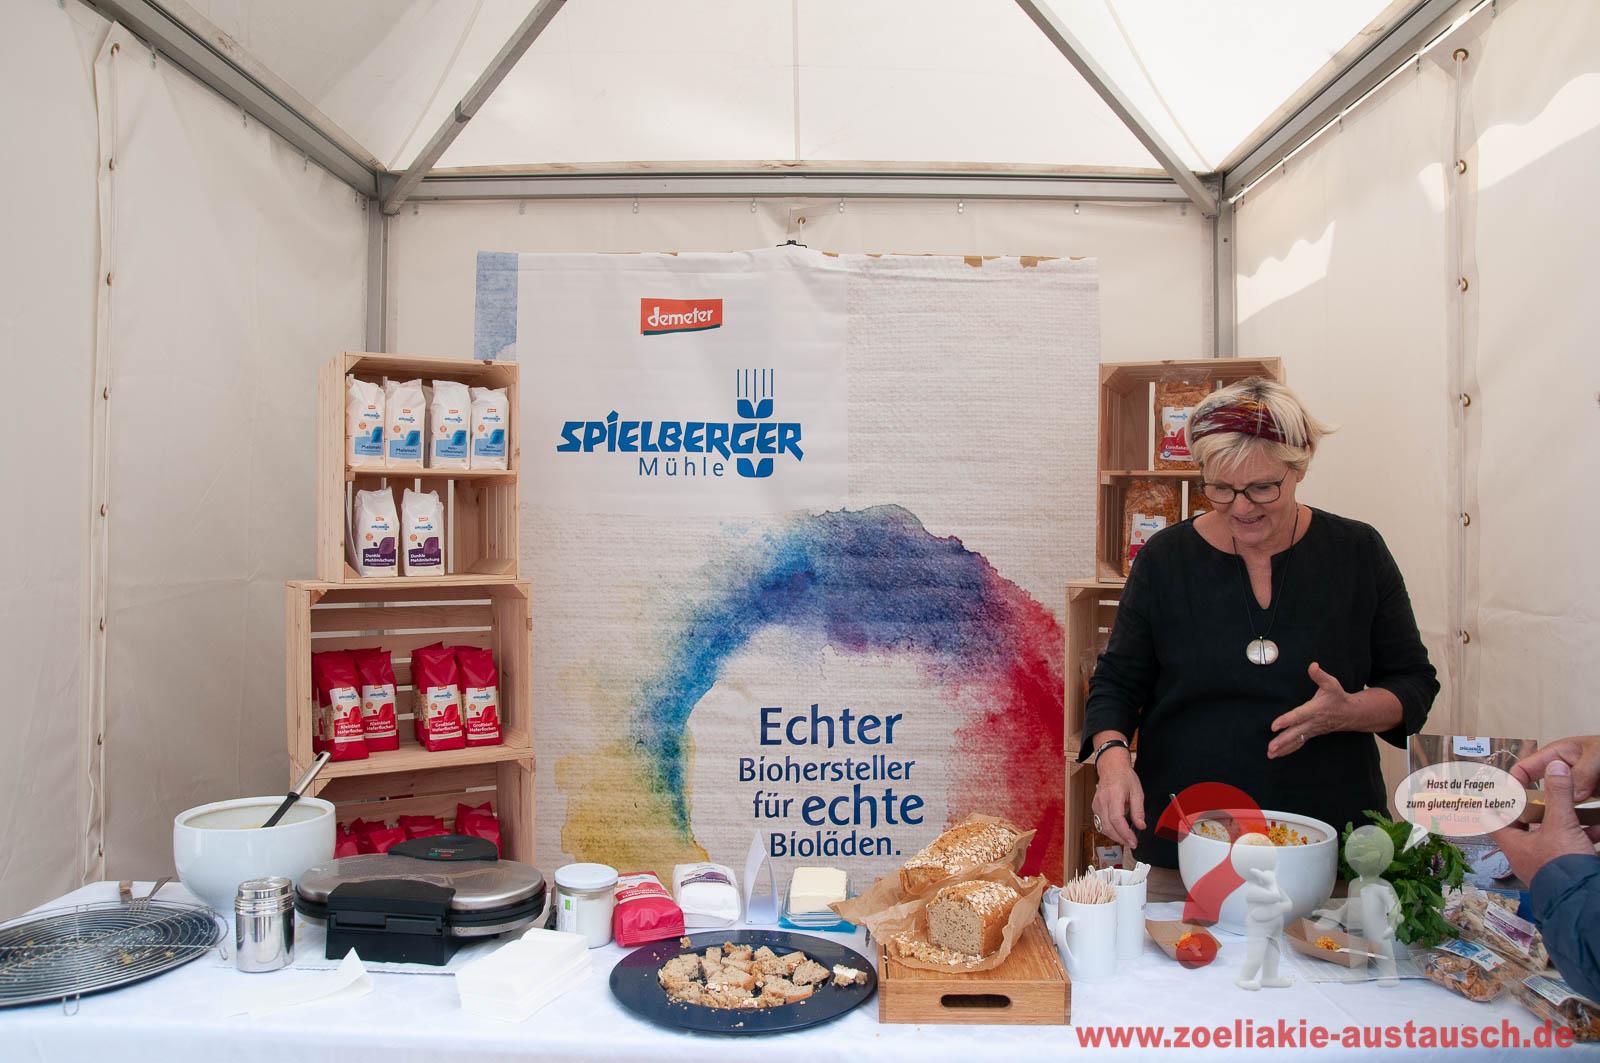 WZT_2018_Zoeliakie-Austausch-20180519_030